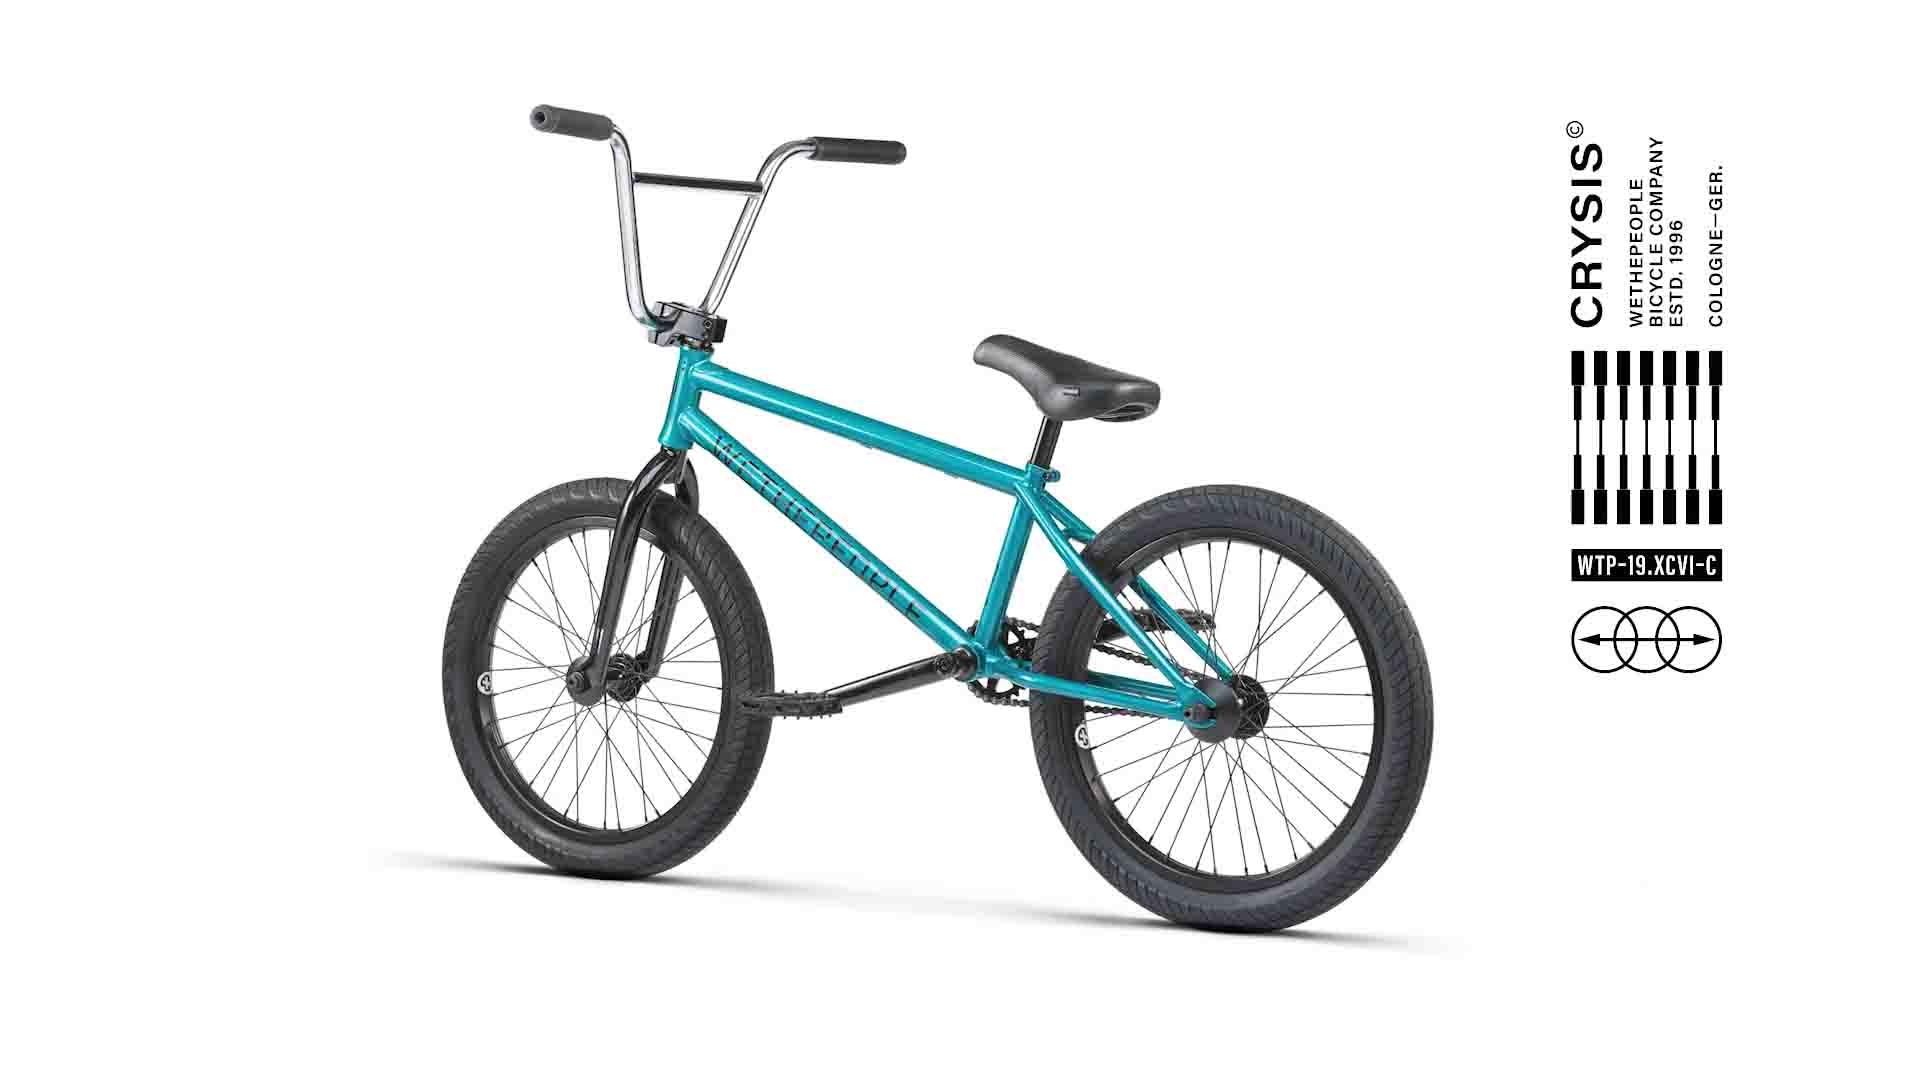 The CRYSIS 2021 Complete Bike - WETHEPEOPLE BMX